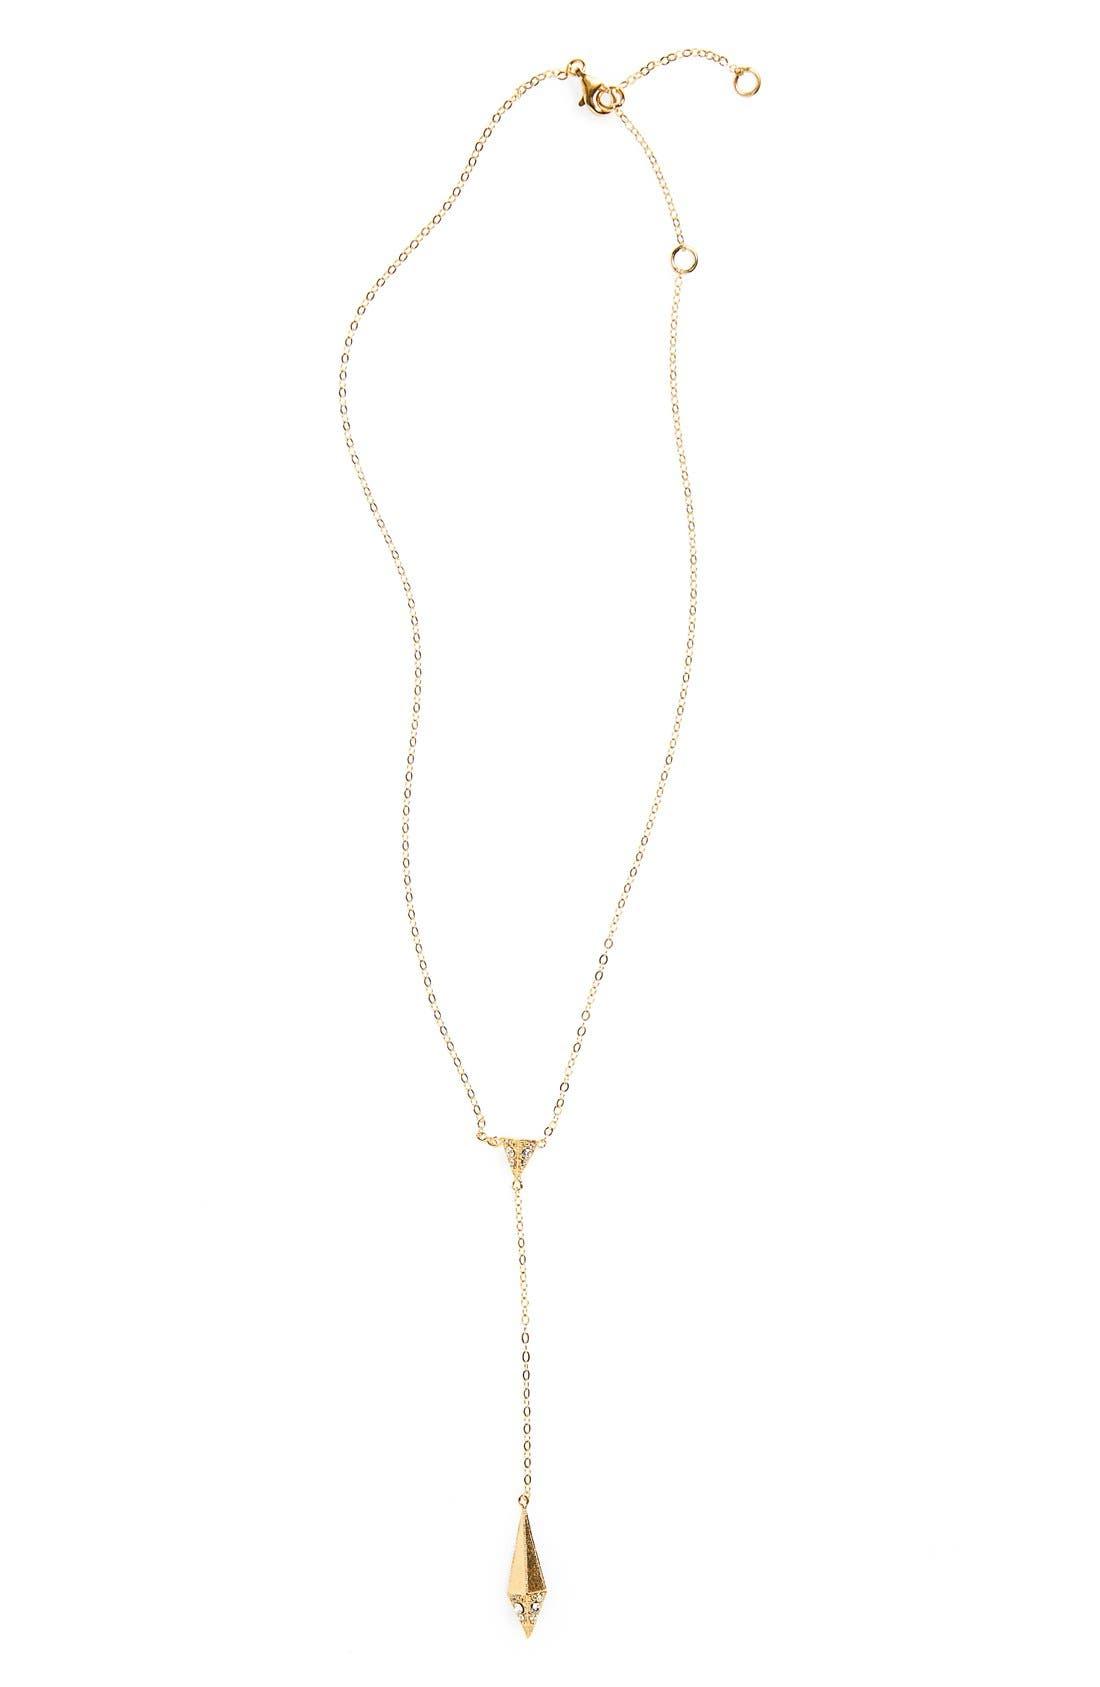 Main Image - Virgins Saints & Angels 'Rayos' Necklace